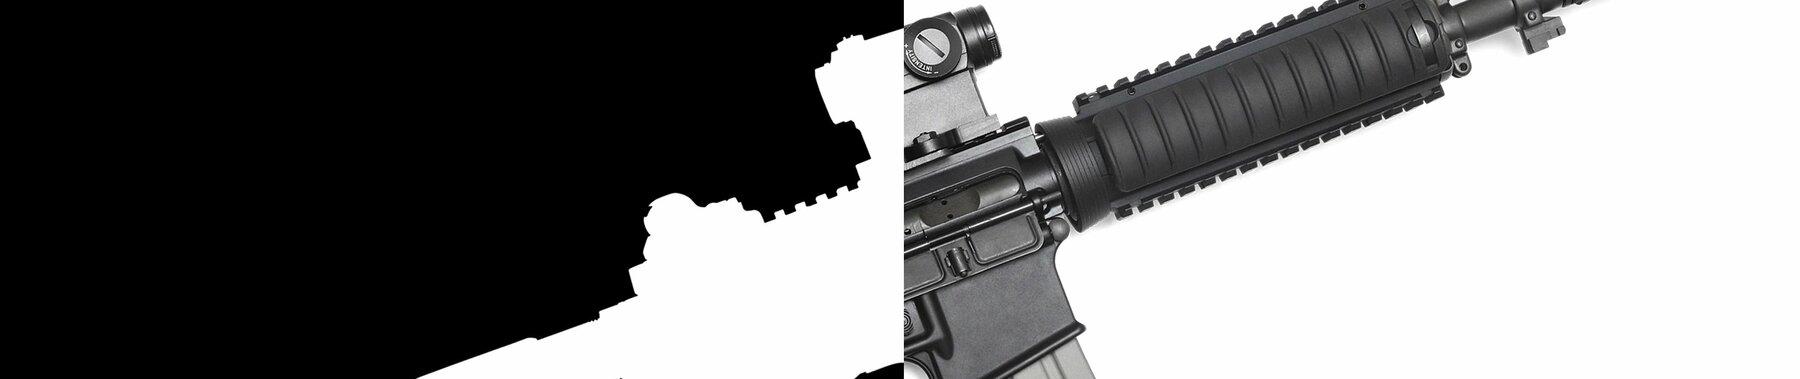 Guns Object Detection | Kaggle